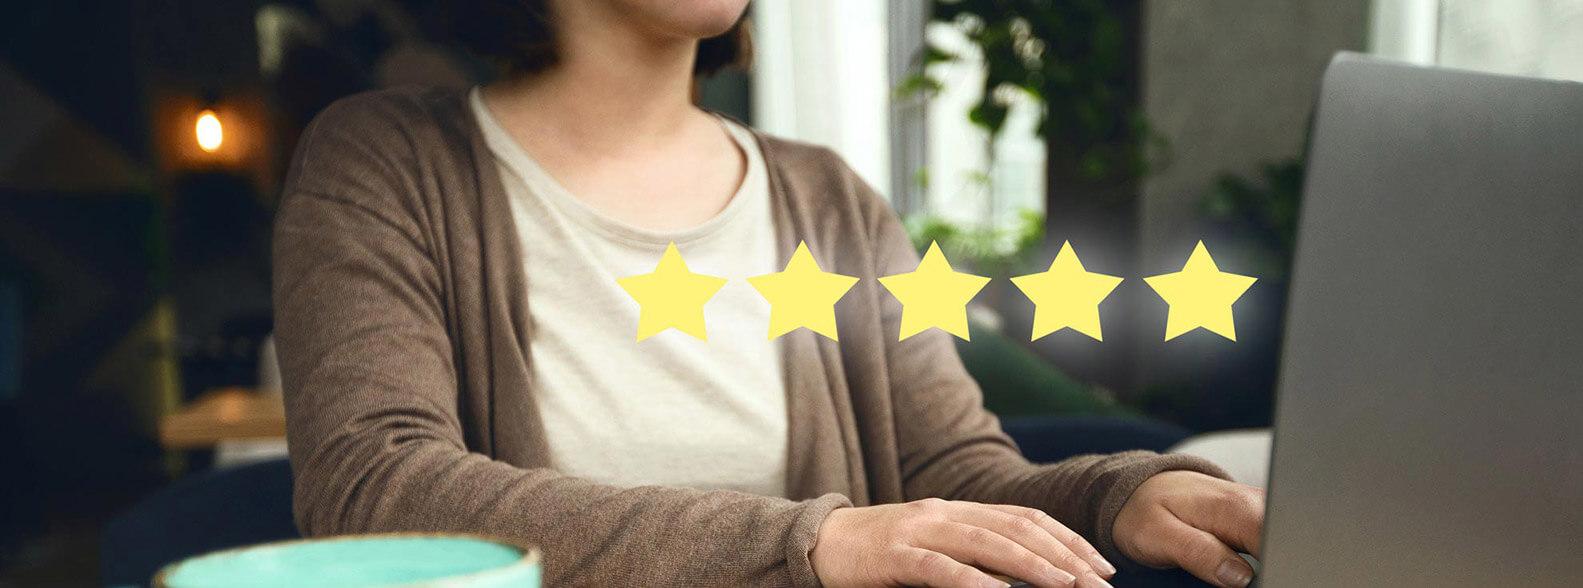 Digital Marketing Agency FairTech Customer Reviews